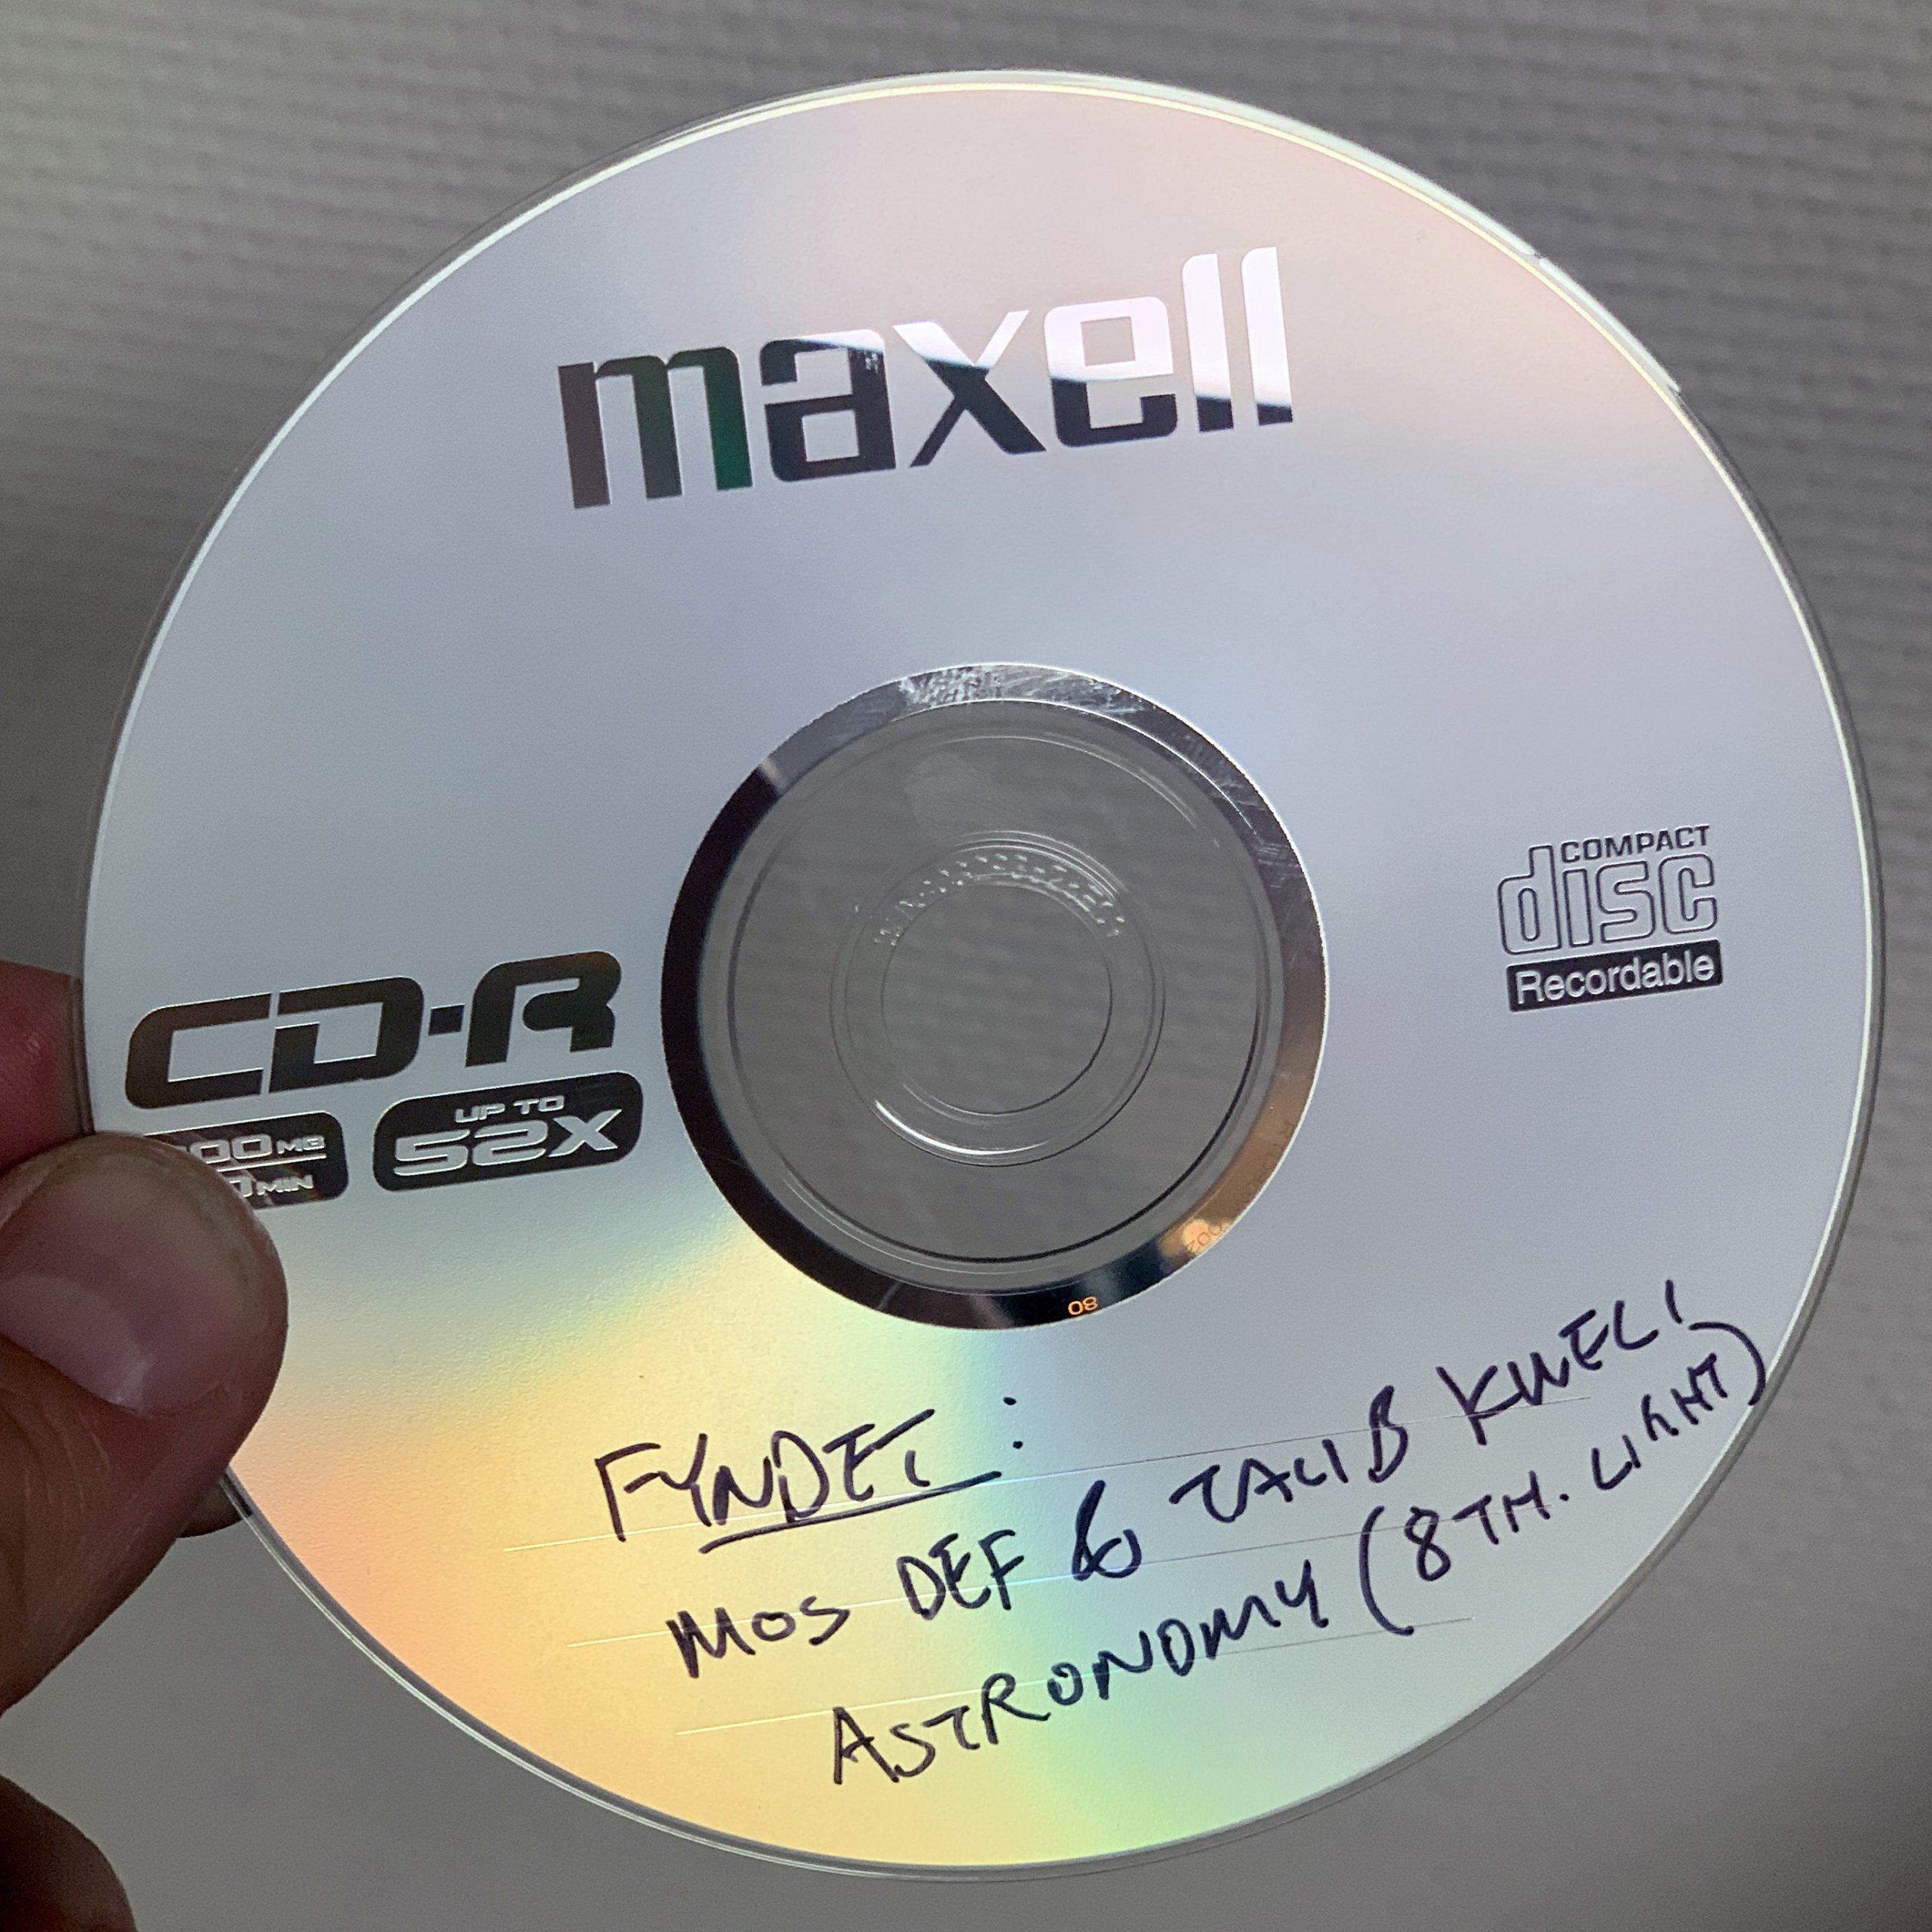 Black Star – Astronomy (8th Light) [cd/mp3, 1998]